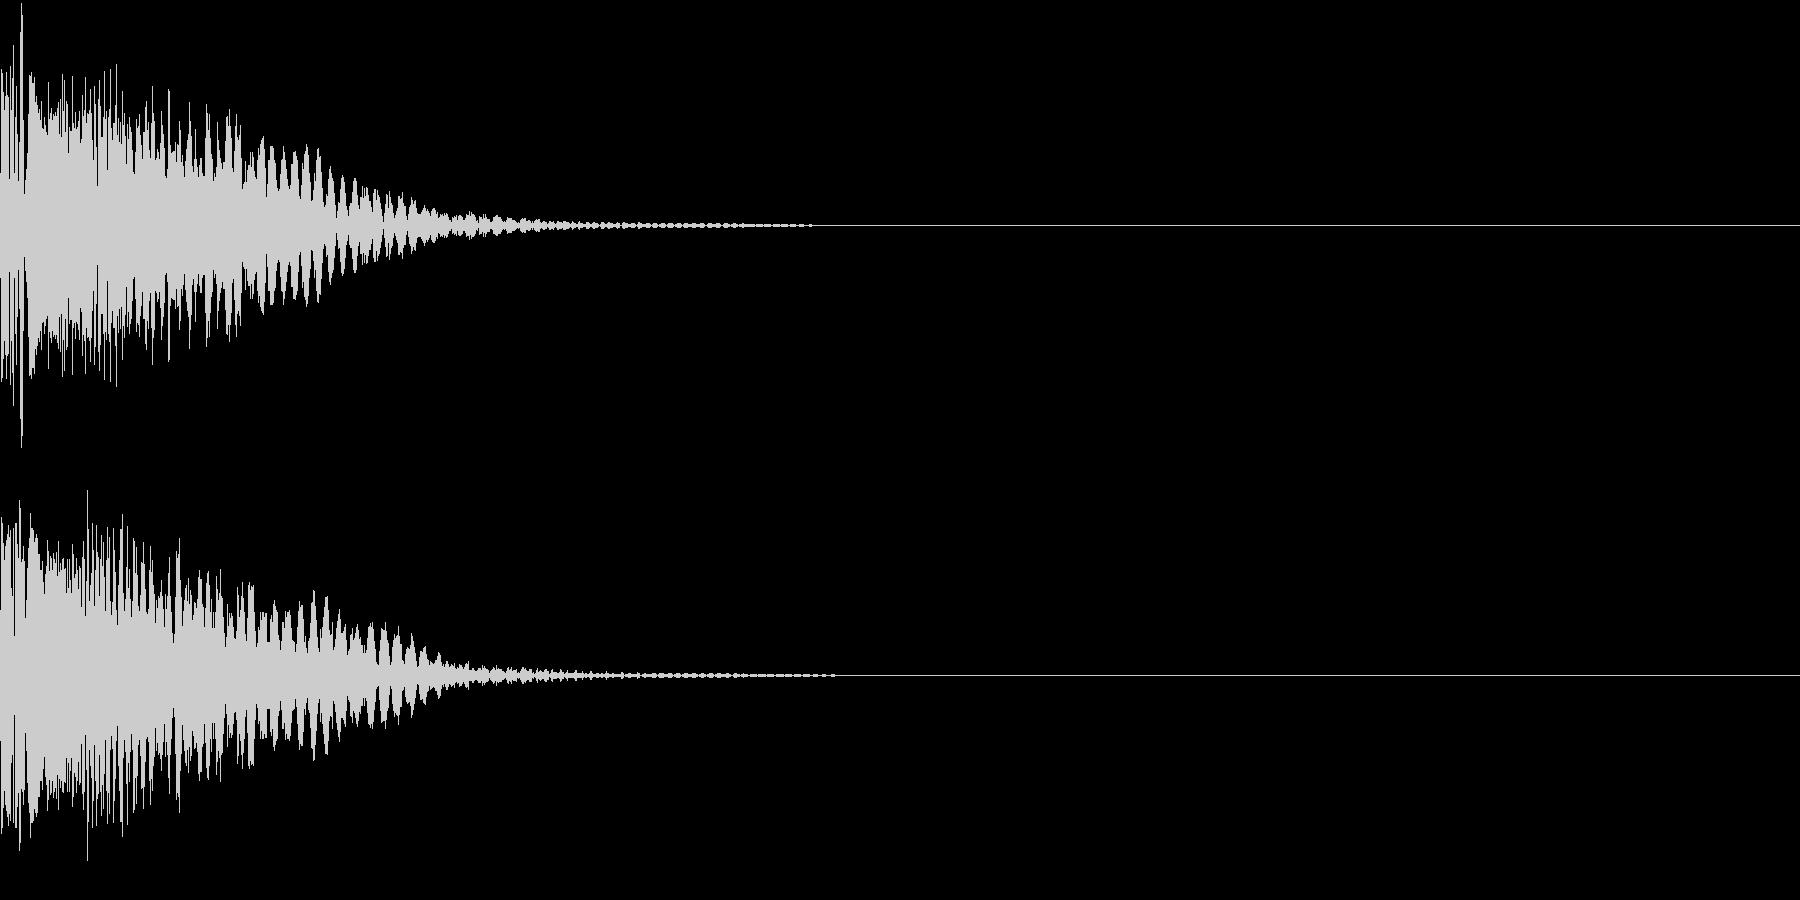 LaserBeam レーザービーム攻撃音の未再生の波形